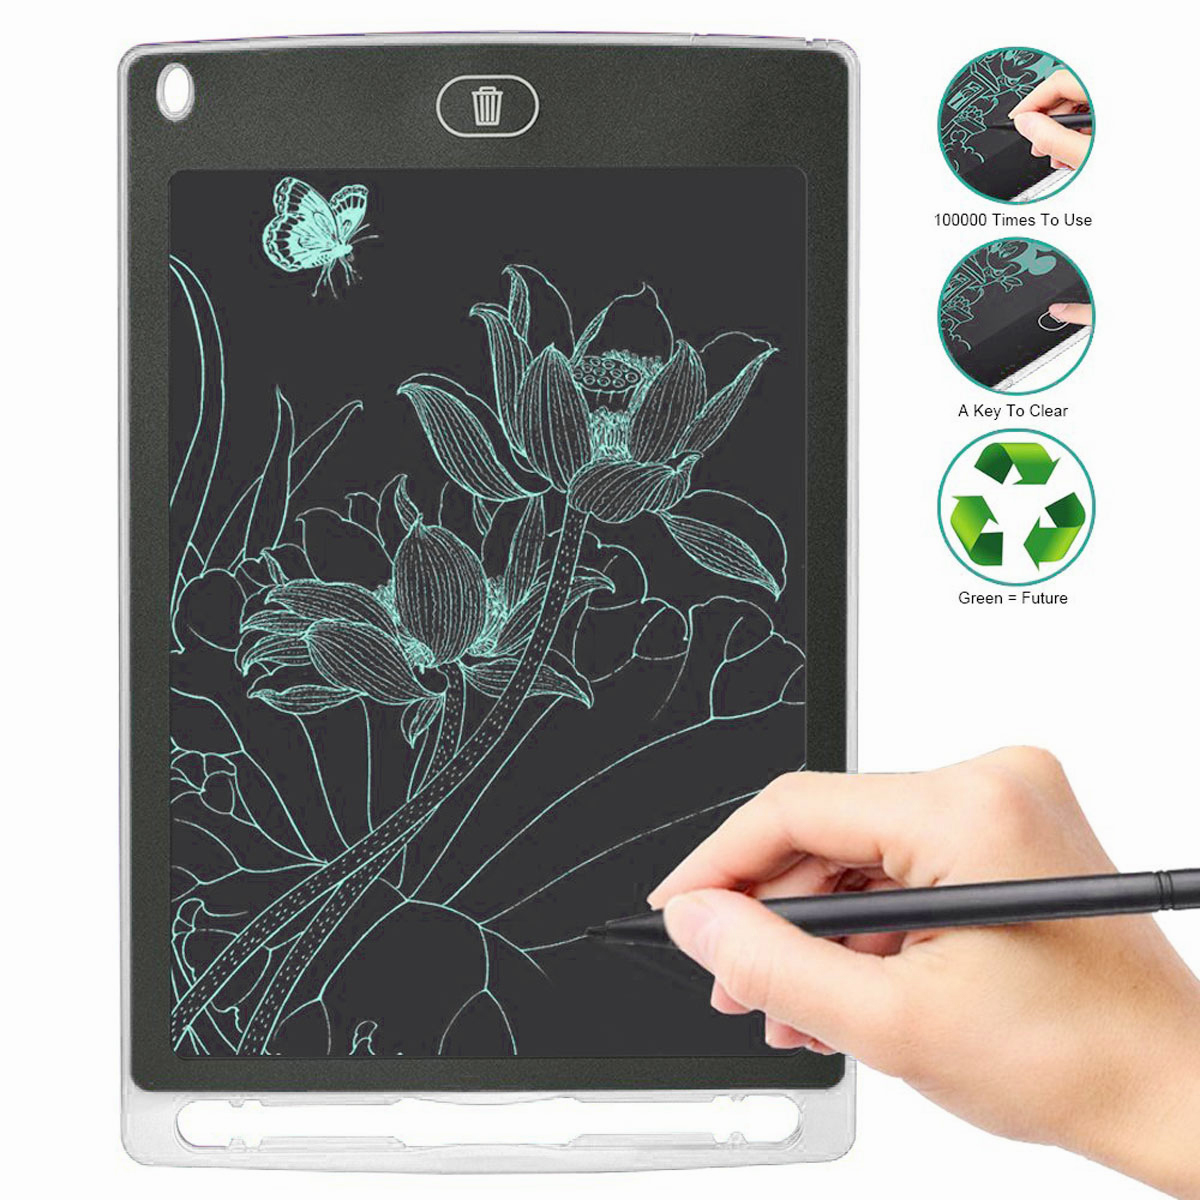 8-5-034-Digital-Electronic-LCD-Writing-Tablet-Drawing-Pad-eWriter-Board-For-Kids thumbnail 42